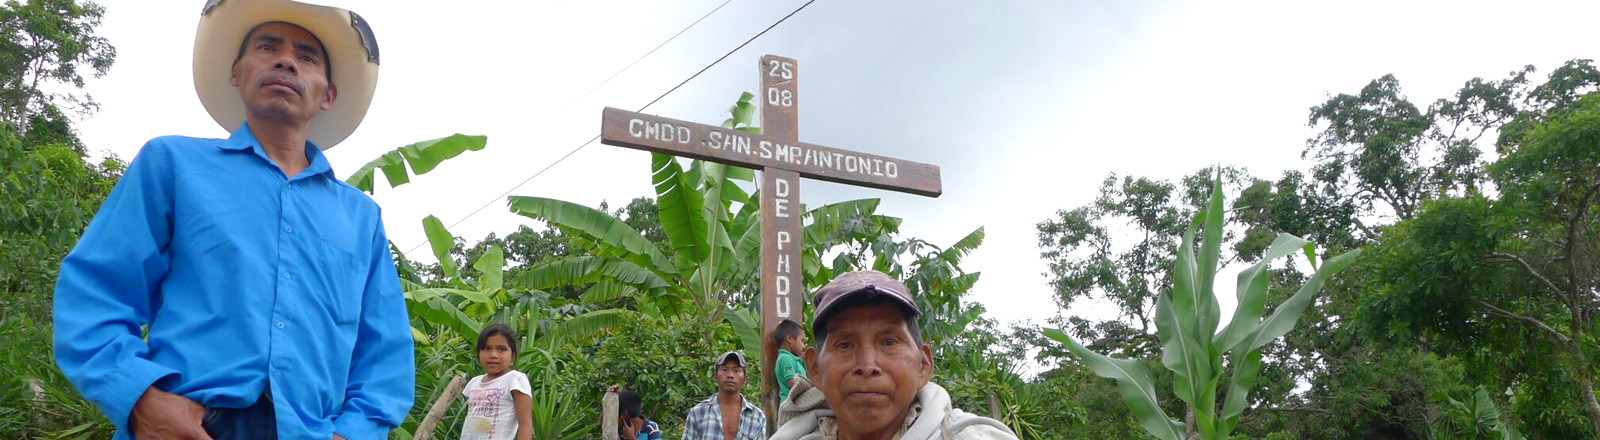 Zwei Bauern in Guatemala